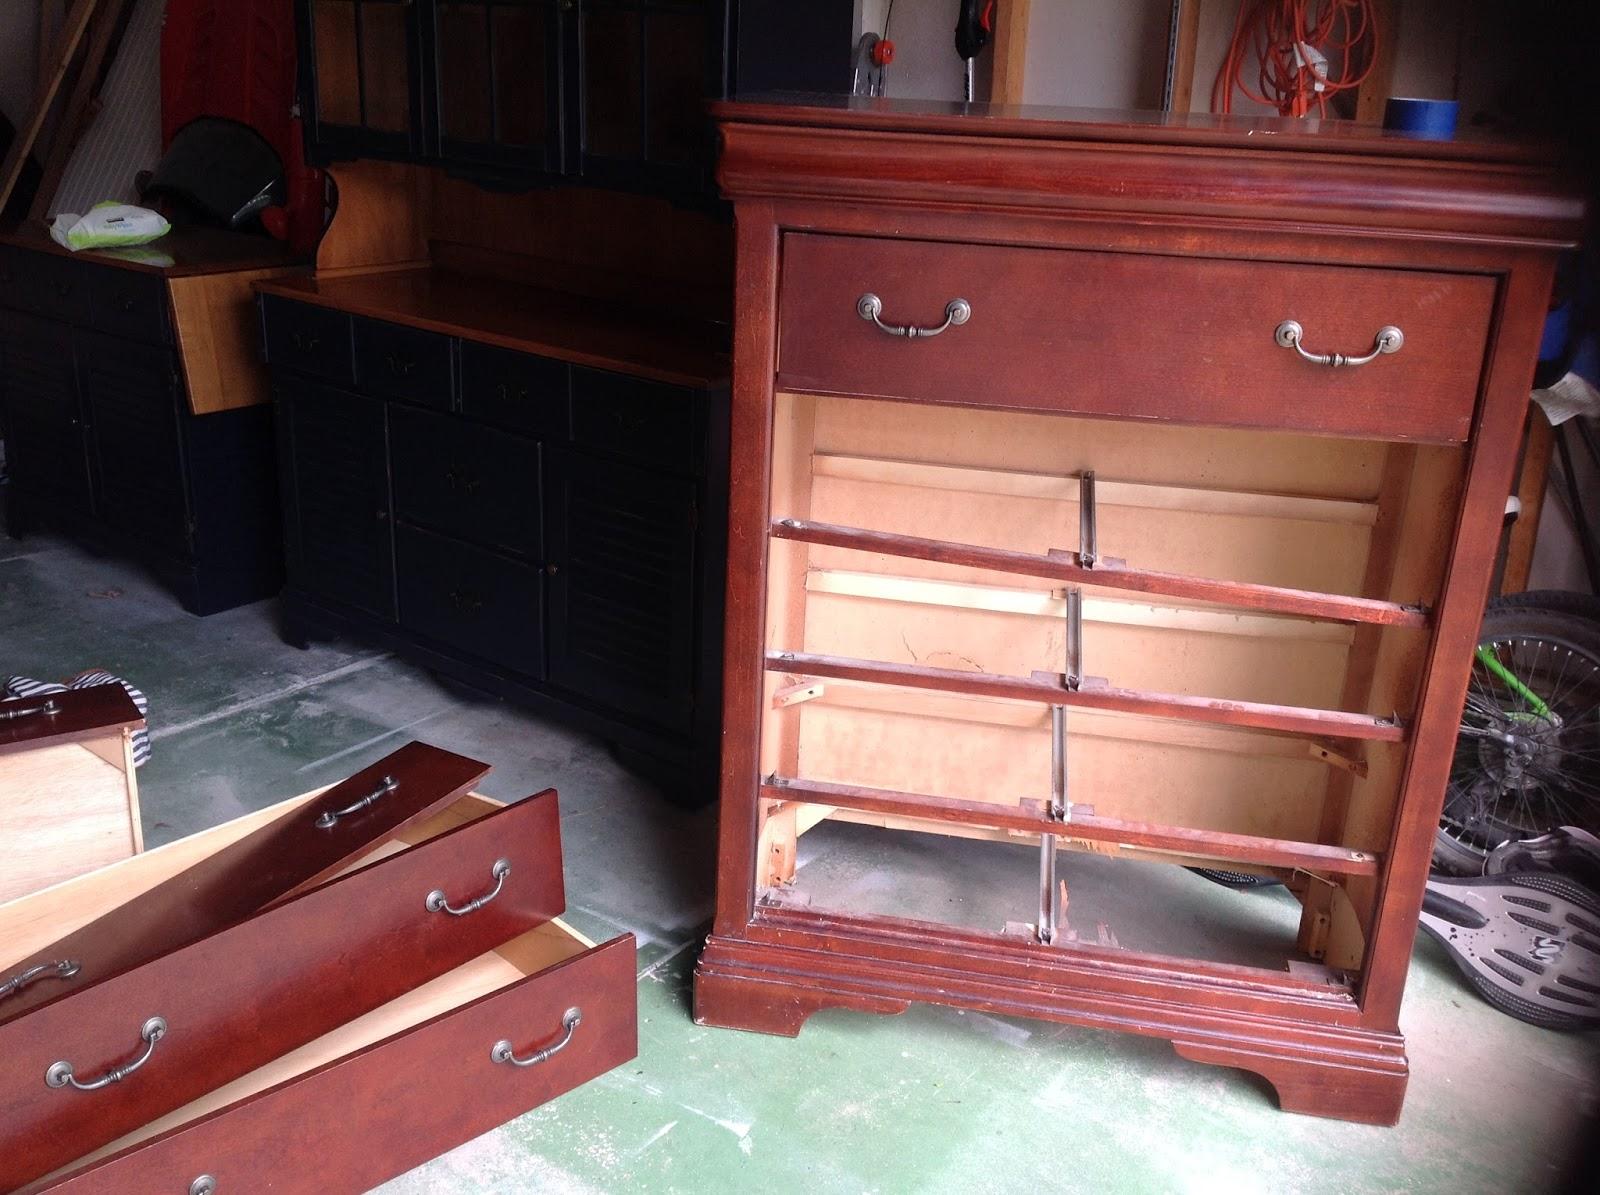 mimiberry creations dud to stud diy dresser makeover. Black Bedroom Furniture Sets. Home Design Ideas